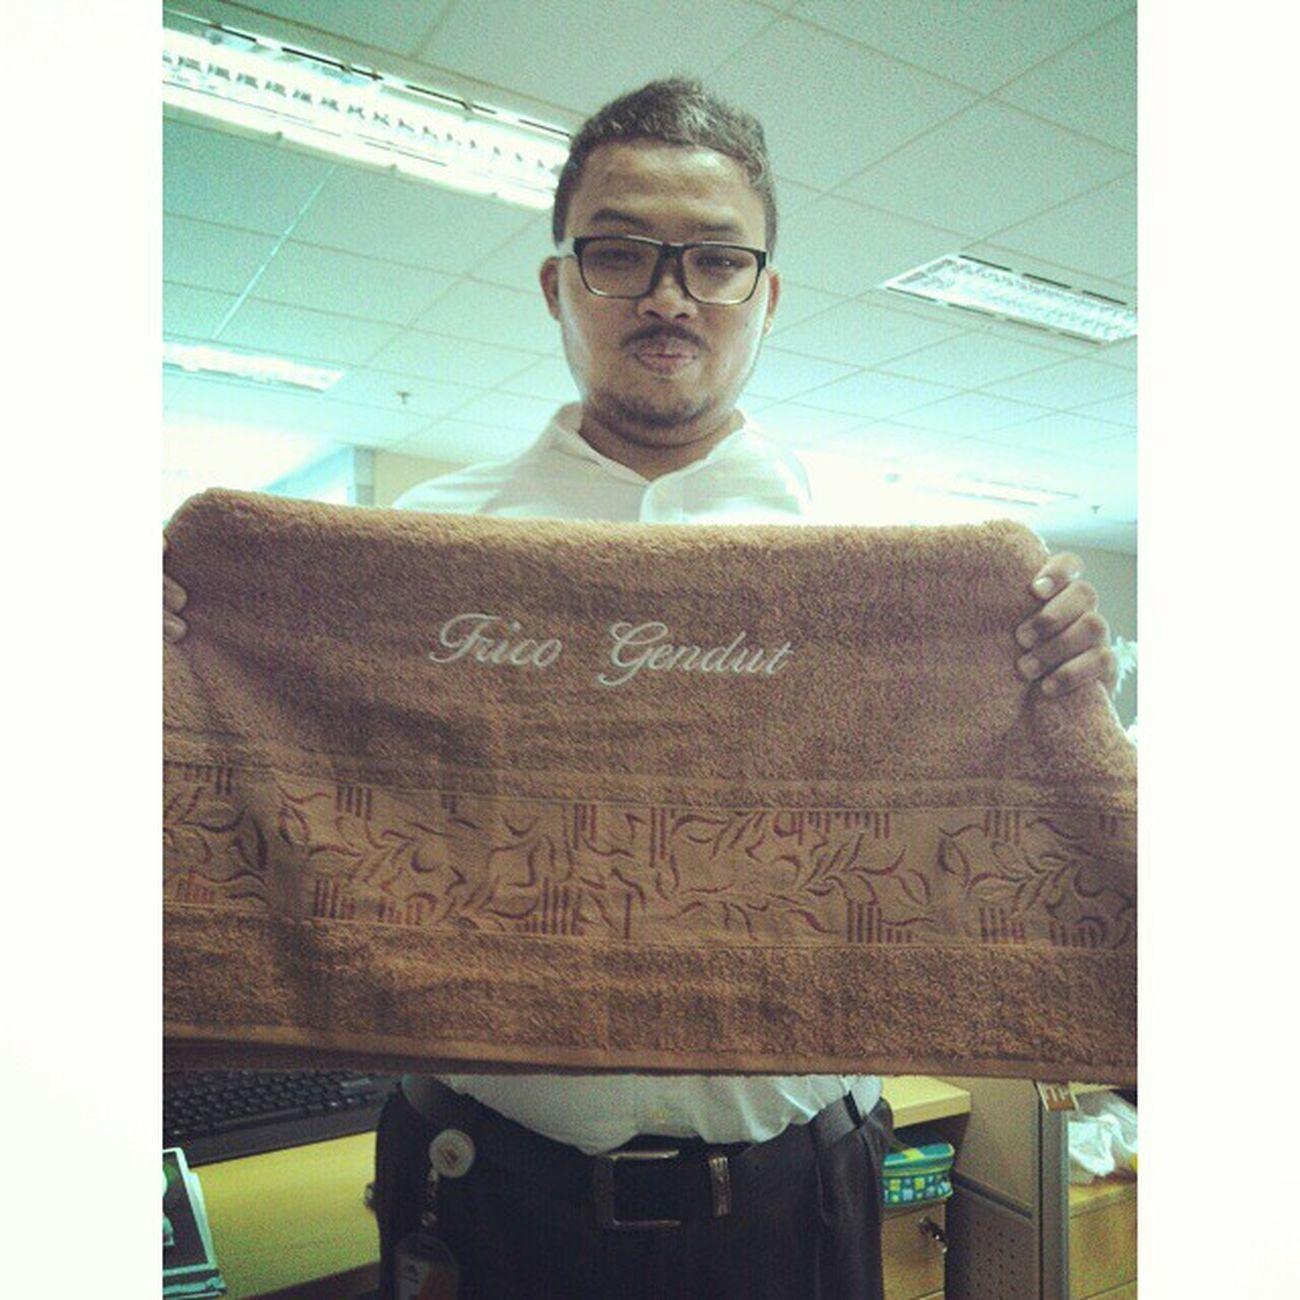 new towel terimakasih teman-teman Fricosihaloho InstaMagAndroid HappyBirthday